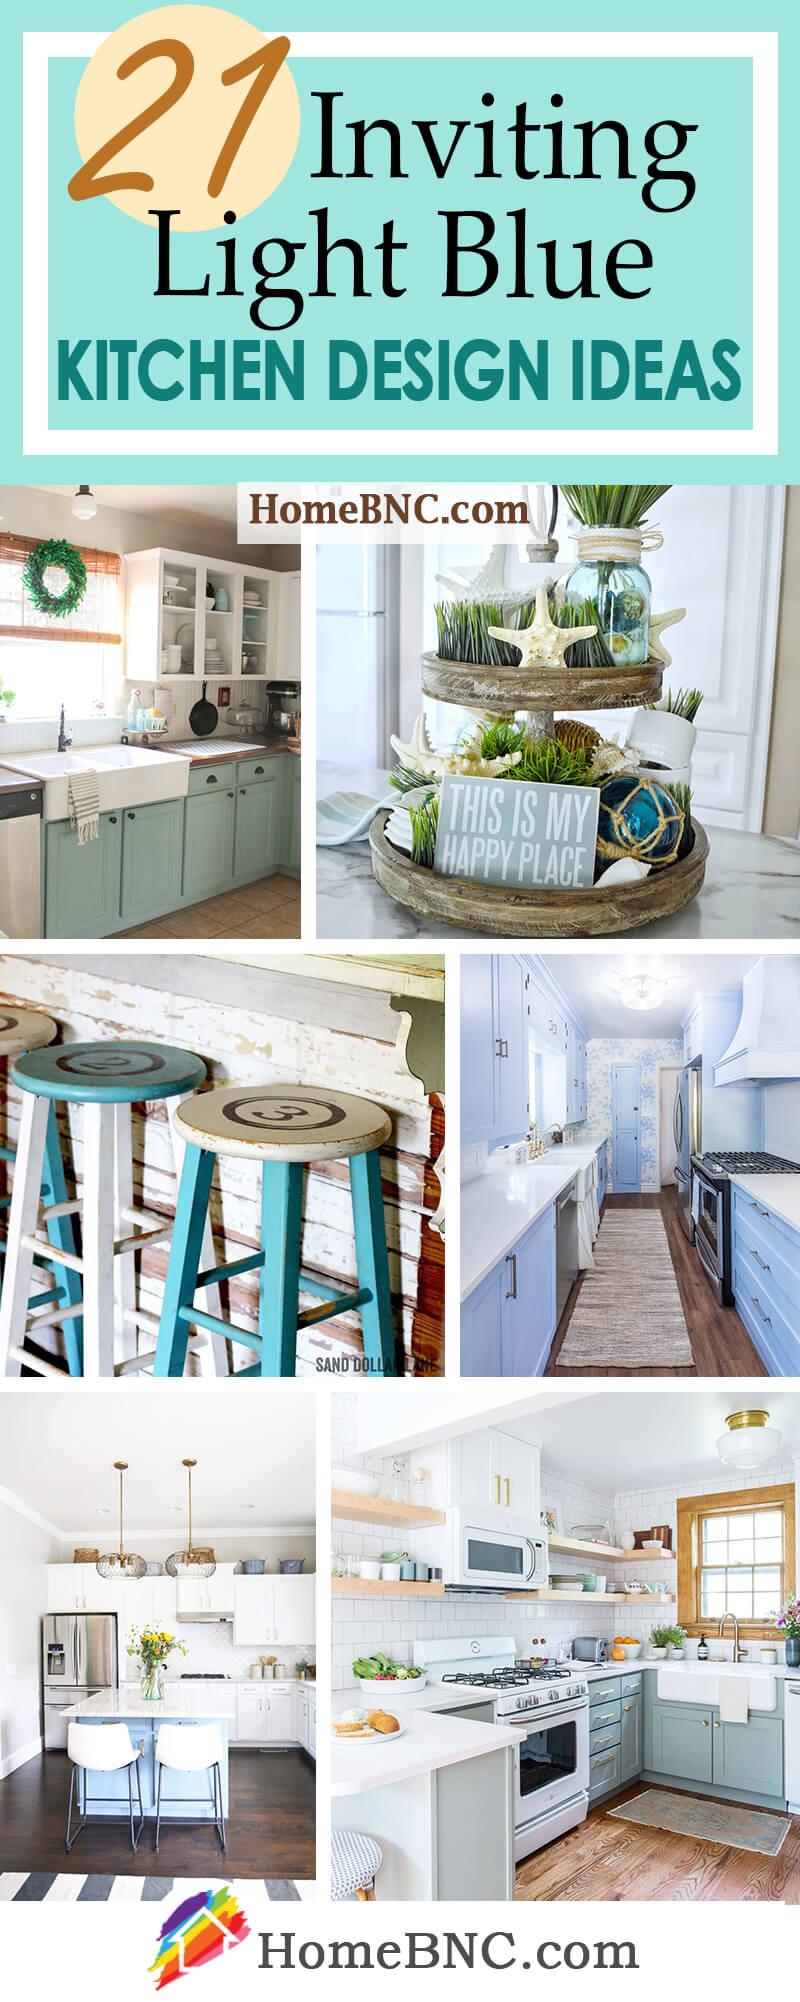 Light Blue Kitchen Design and Decor Ideas